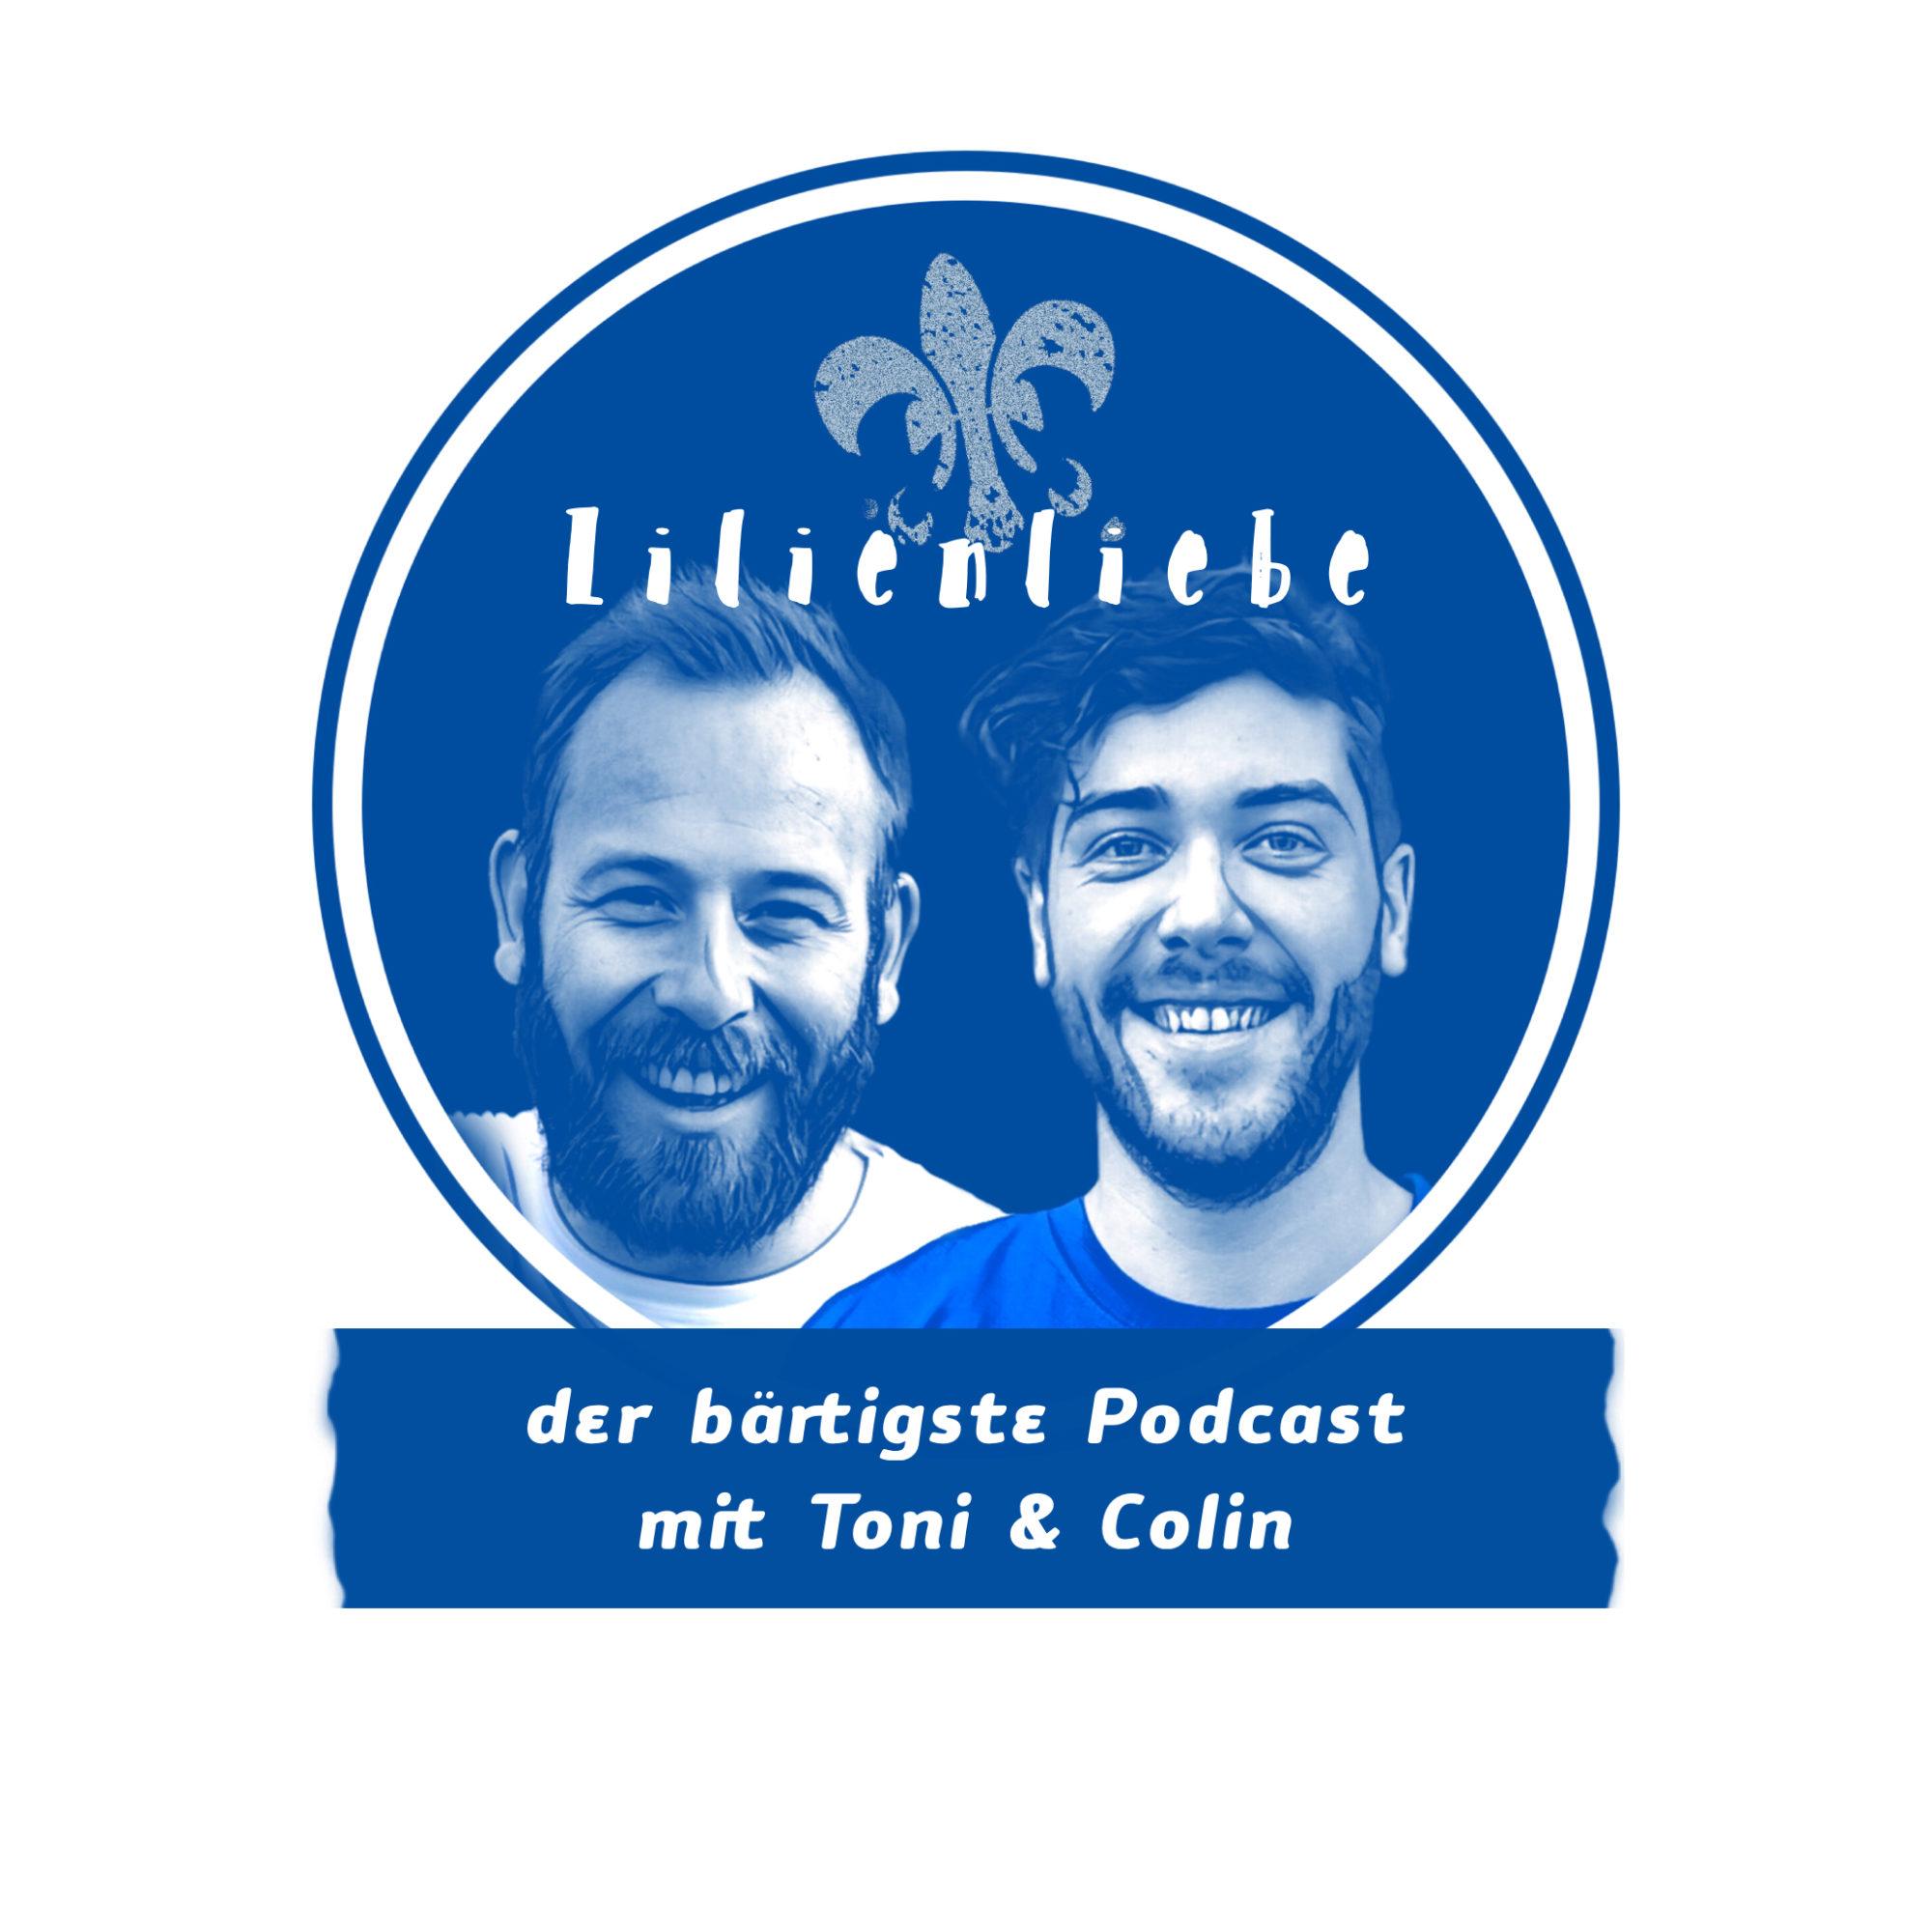 Lilienliebe – Der bärtigste Podcast über den SV Darmstadt 98 mit Toni Sailer & Colin Mahnke